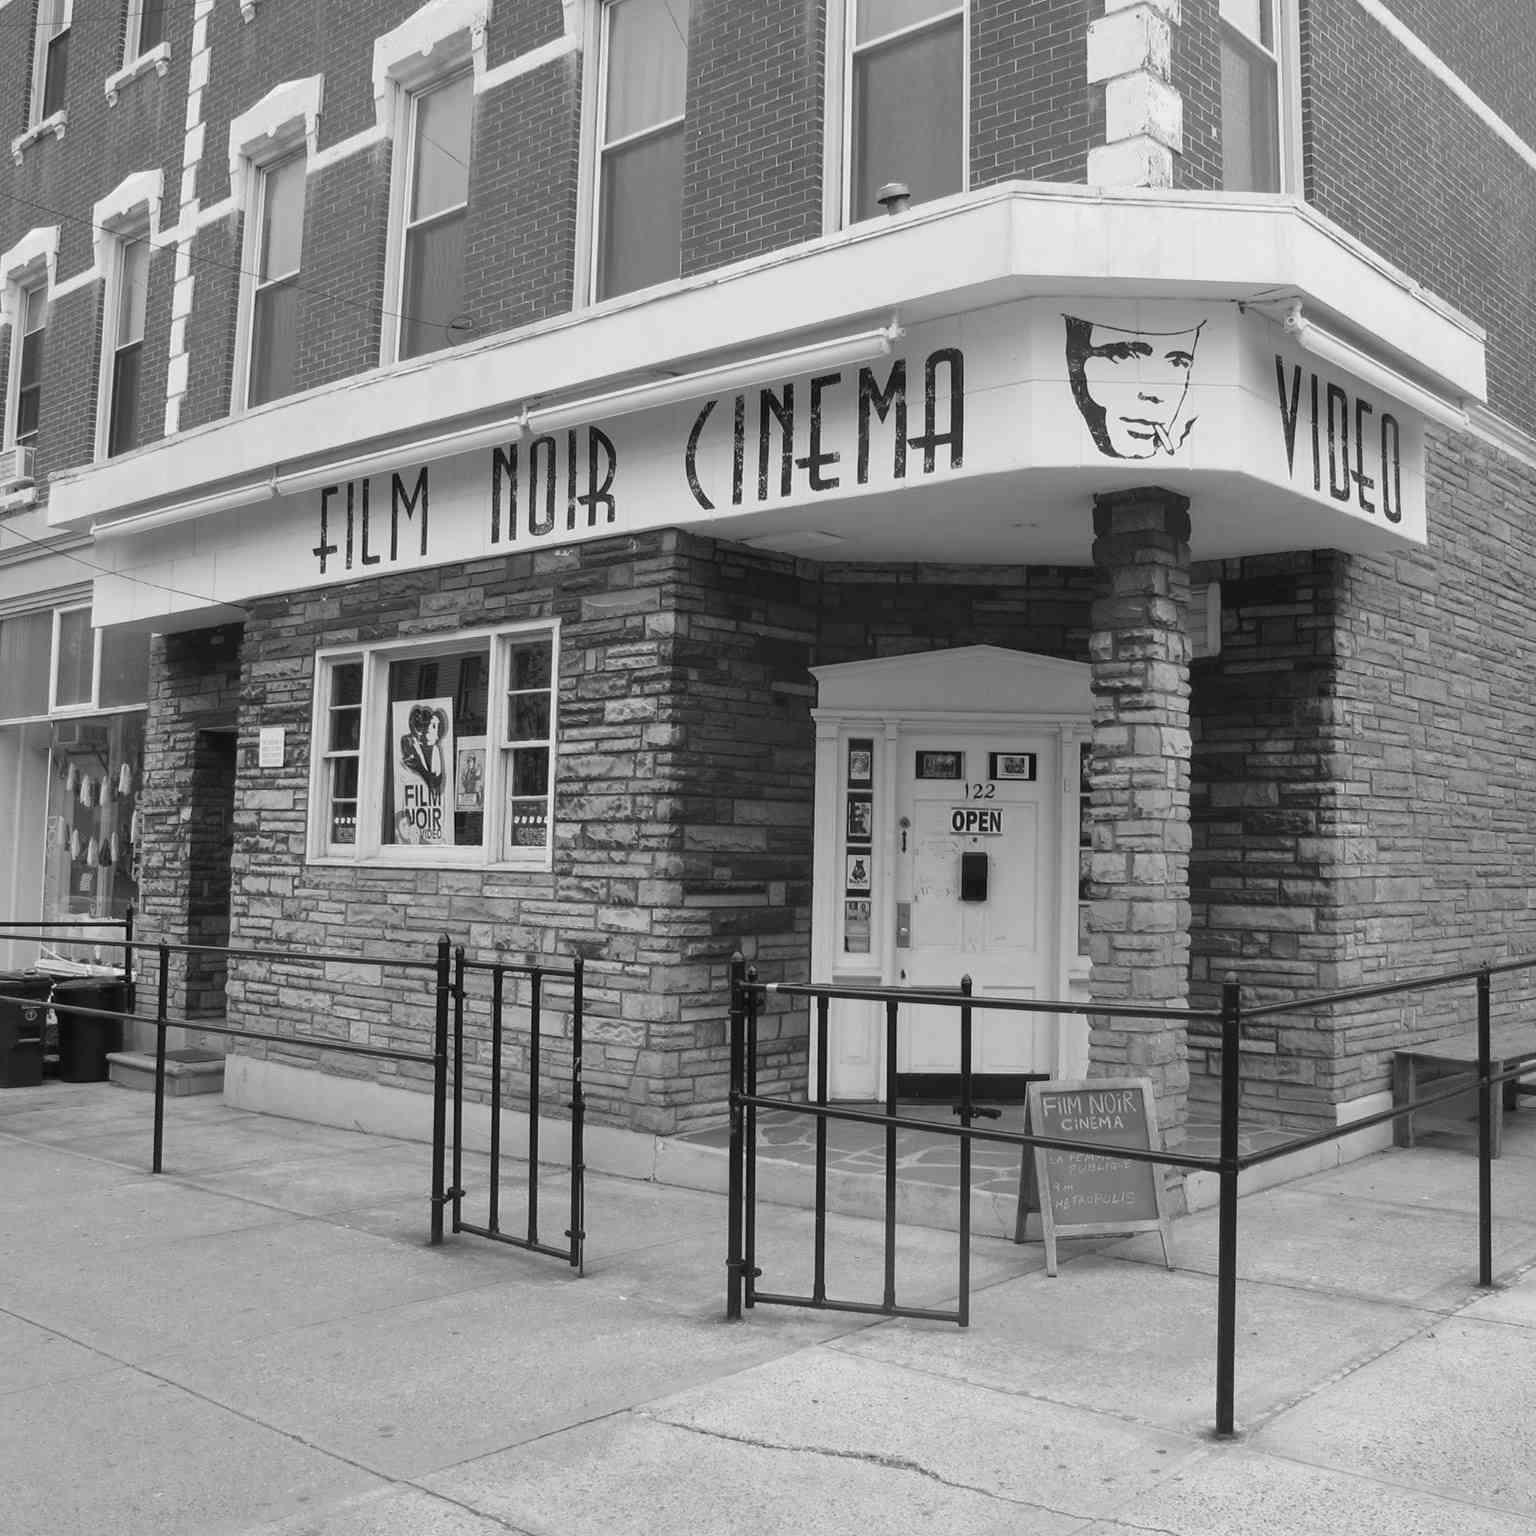 Film Noir Cinema